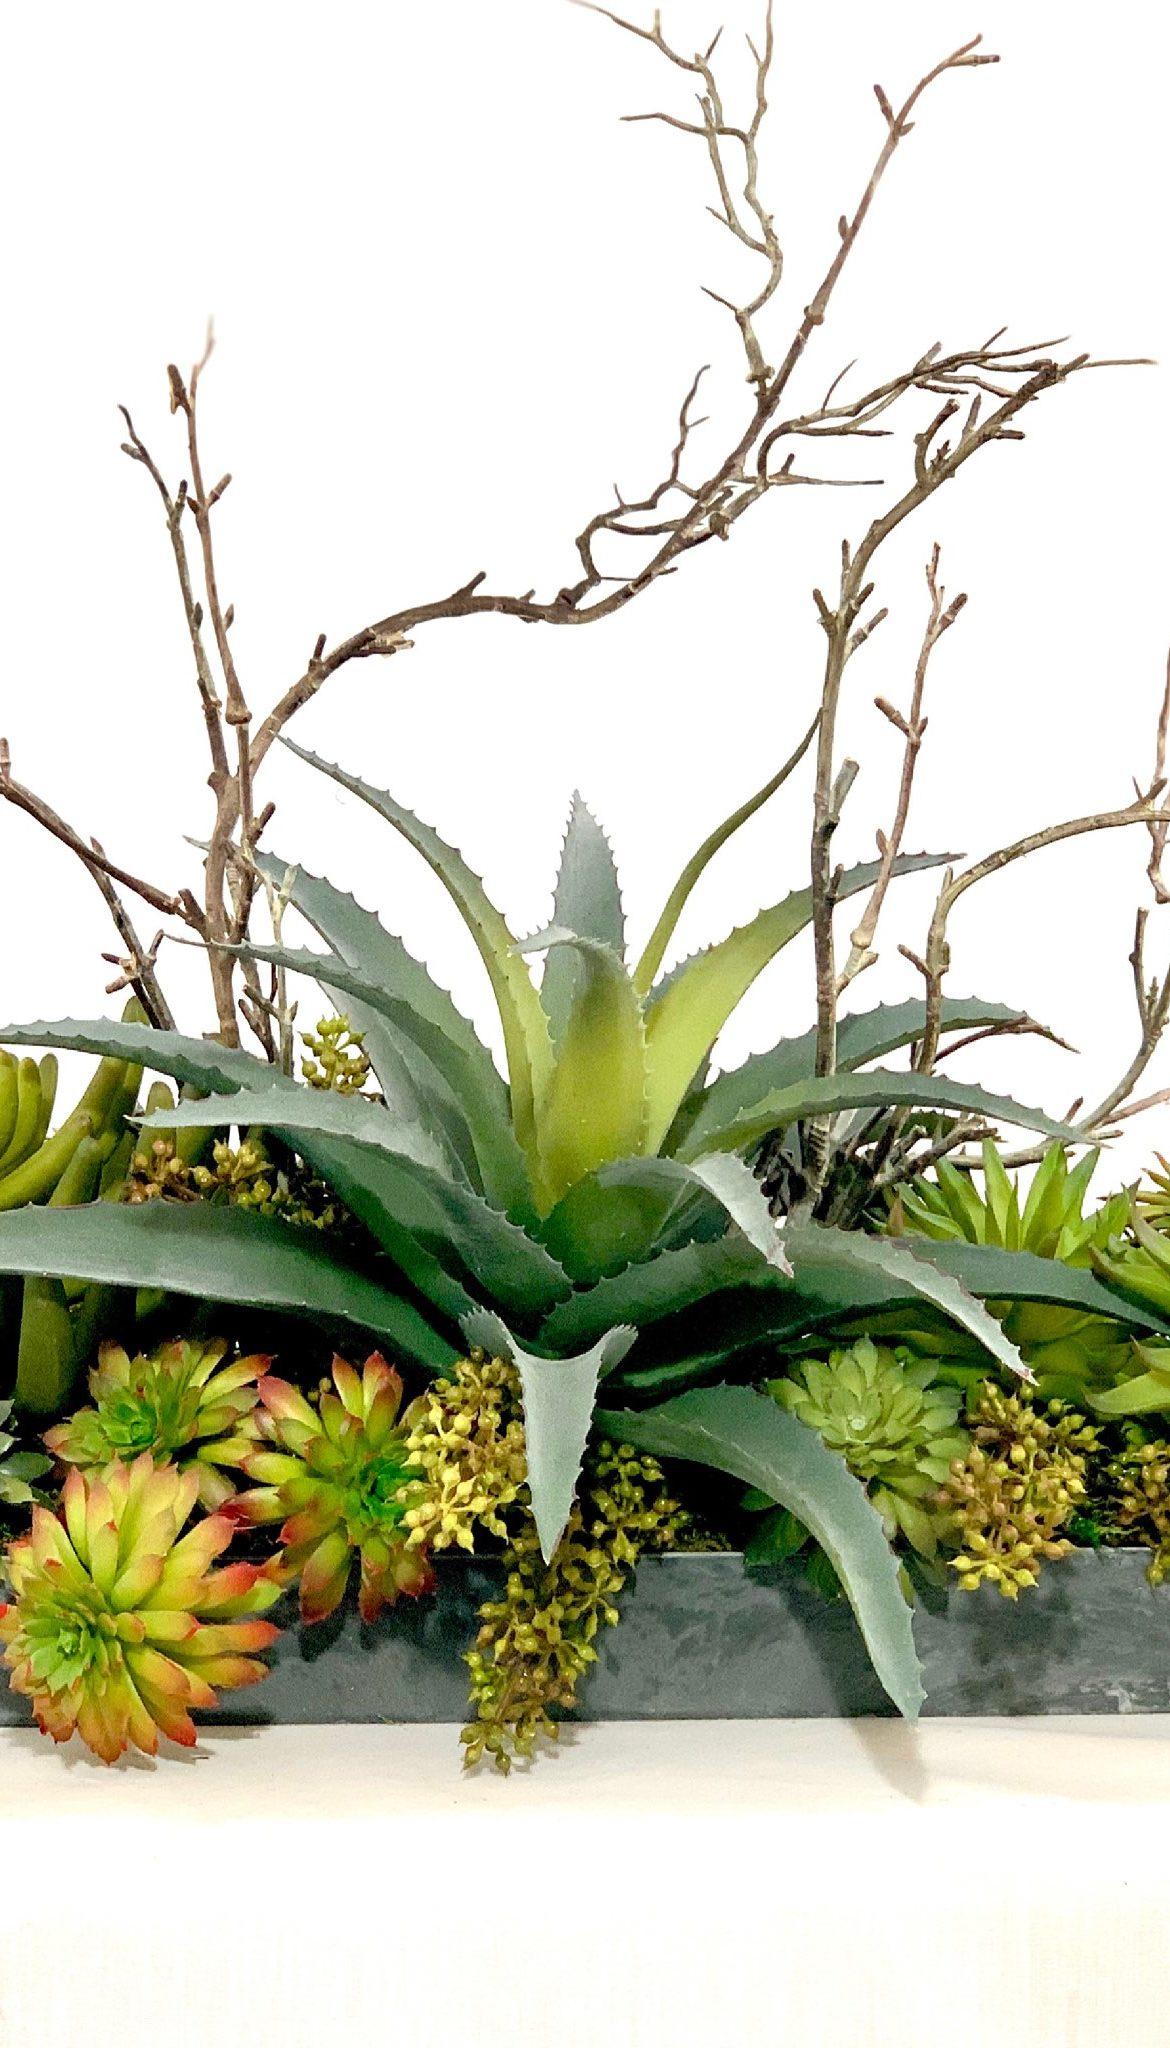 Vortex, Ana Thompson Botanical Art, Rogoway Gallery